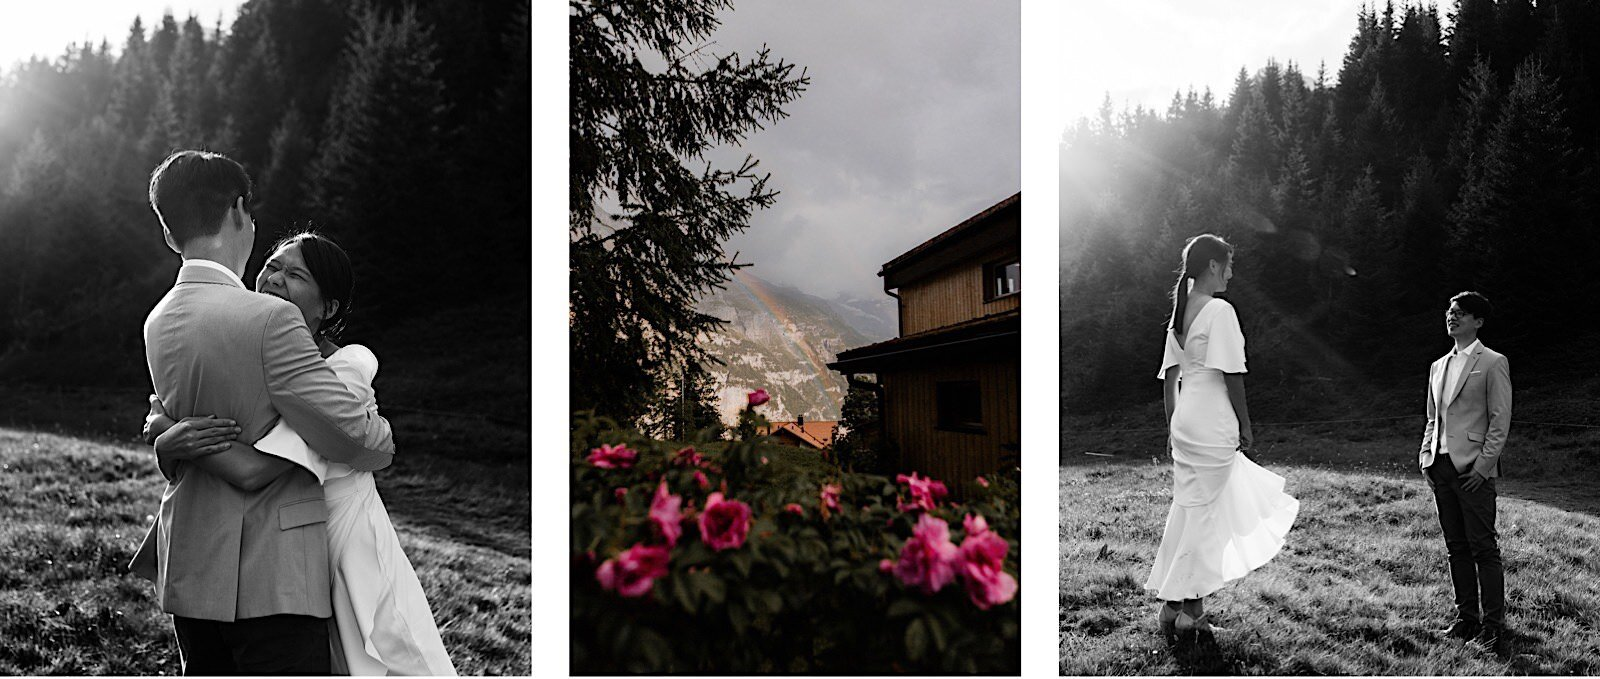 Swiss Alps Photographer Murren Fotomagoria 16.jpg